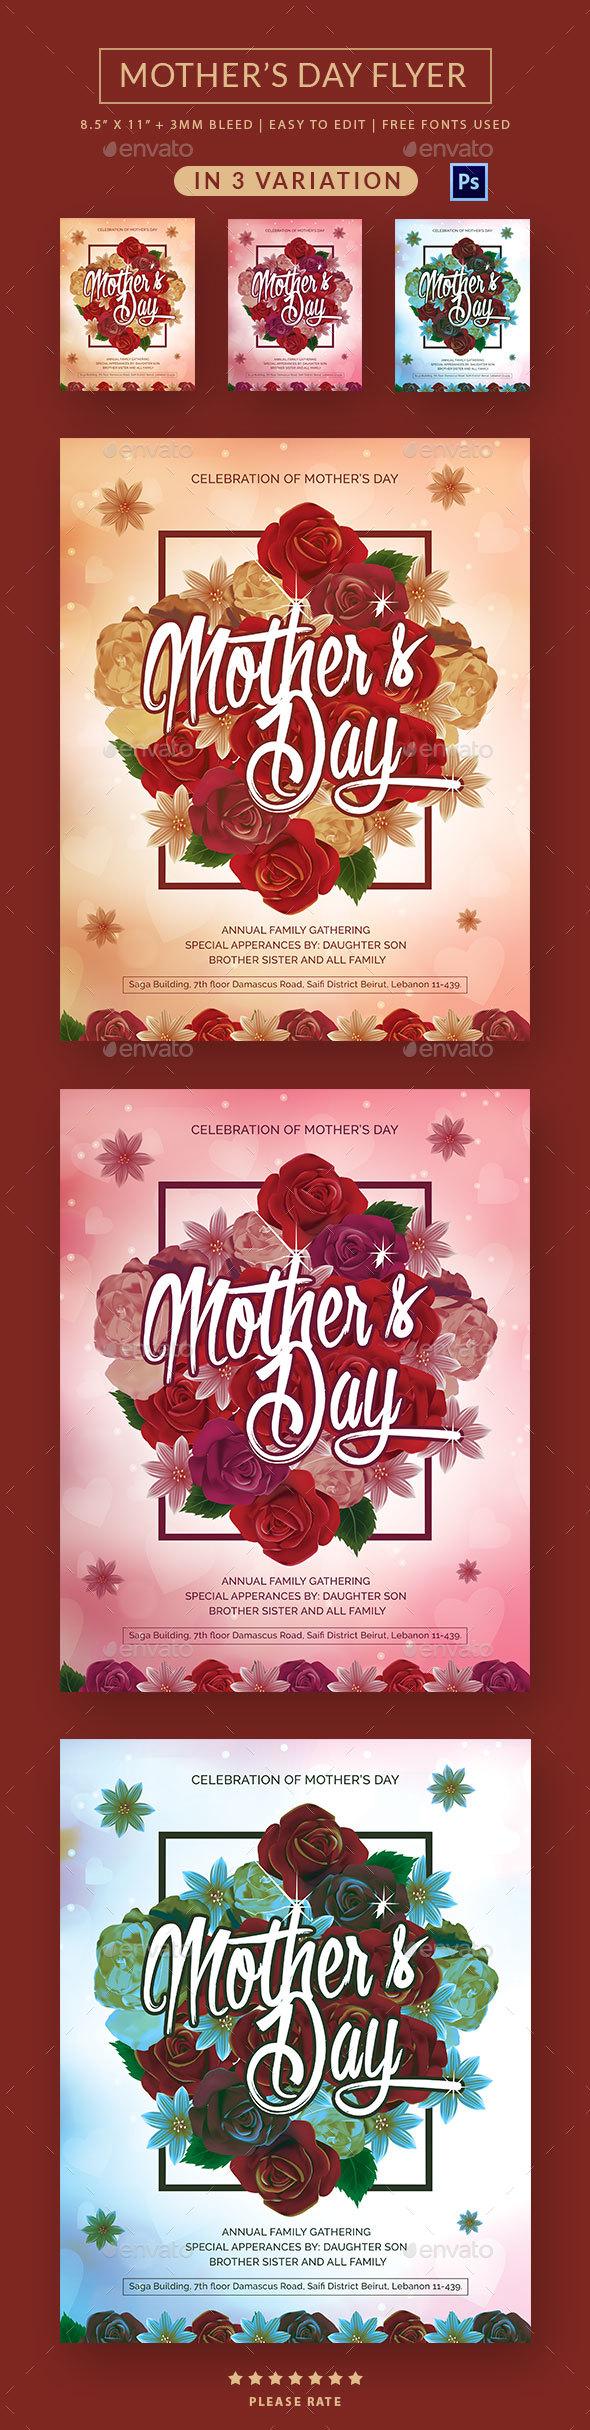 MotherS Day Flyer  FontsLogosIcons    Font Logo